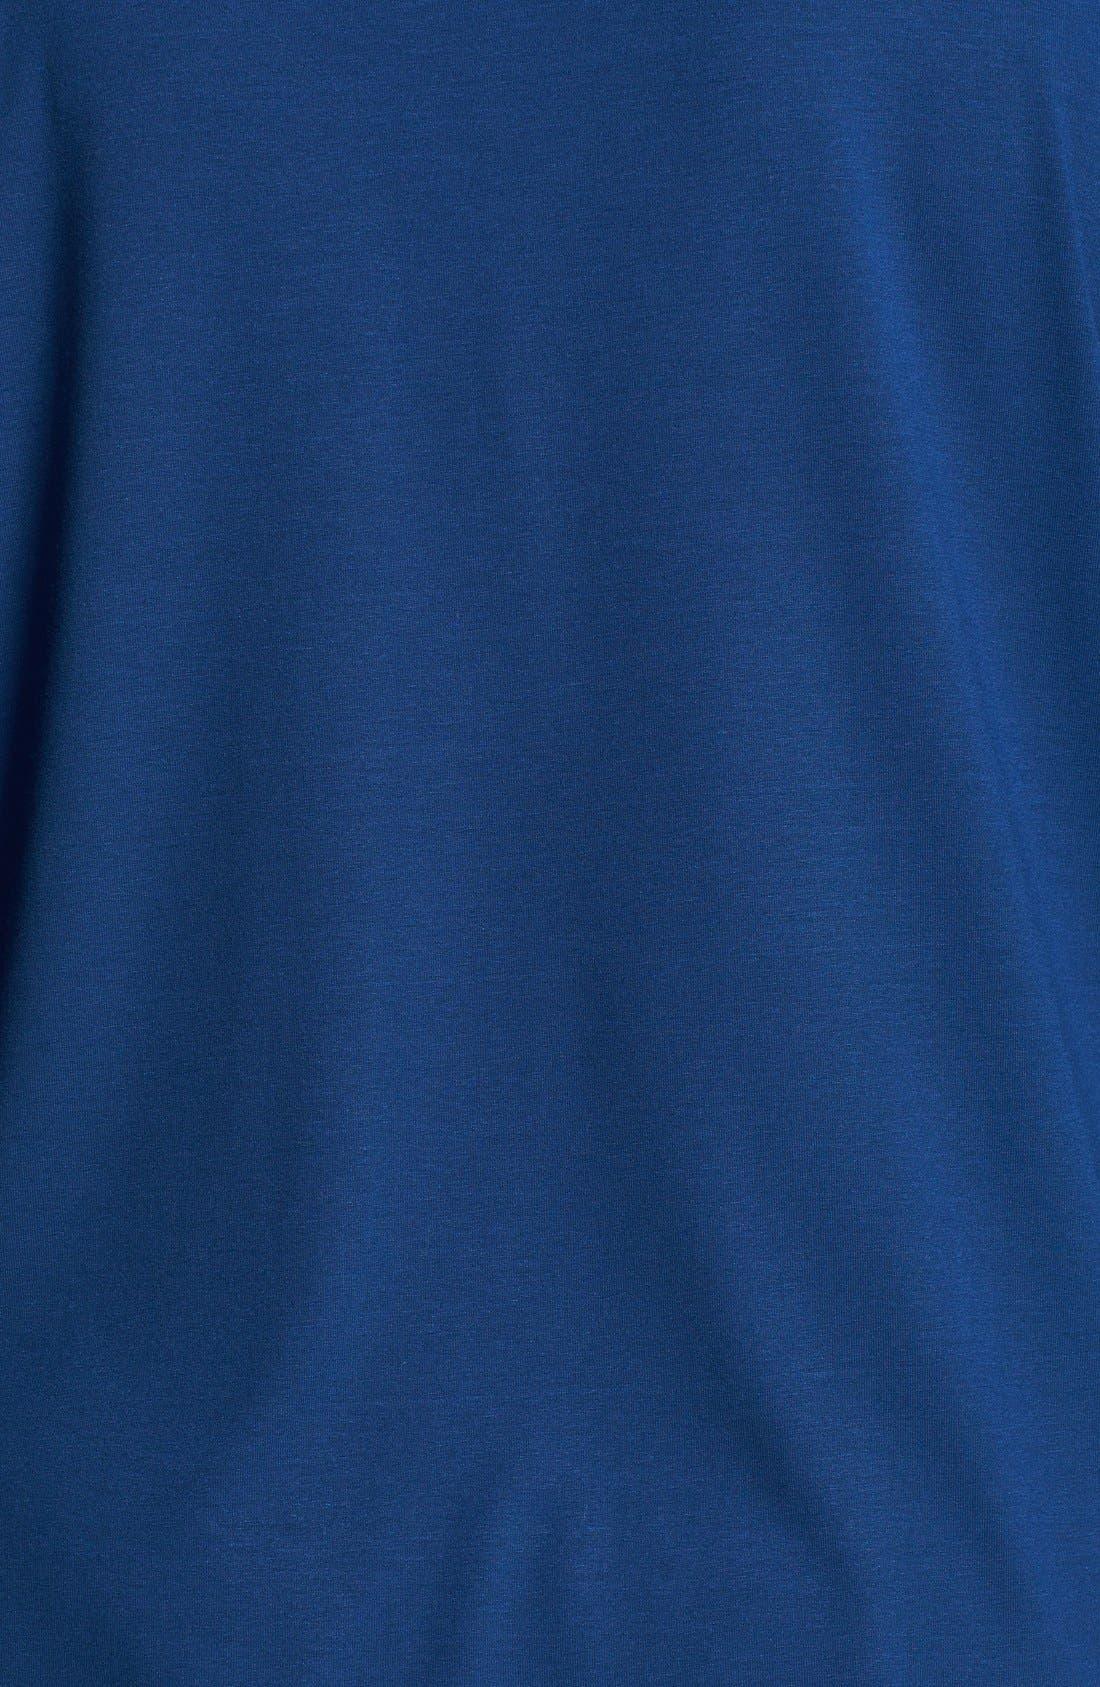 Alternate Image 3  - Eileen Fisher Ballet Neck Jersey Tee (Plus Size)